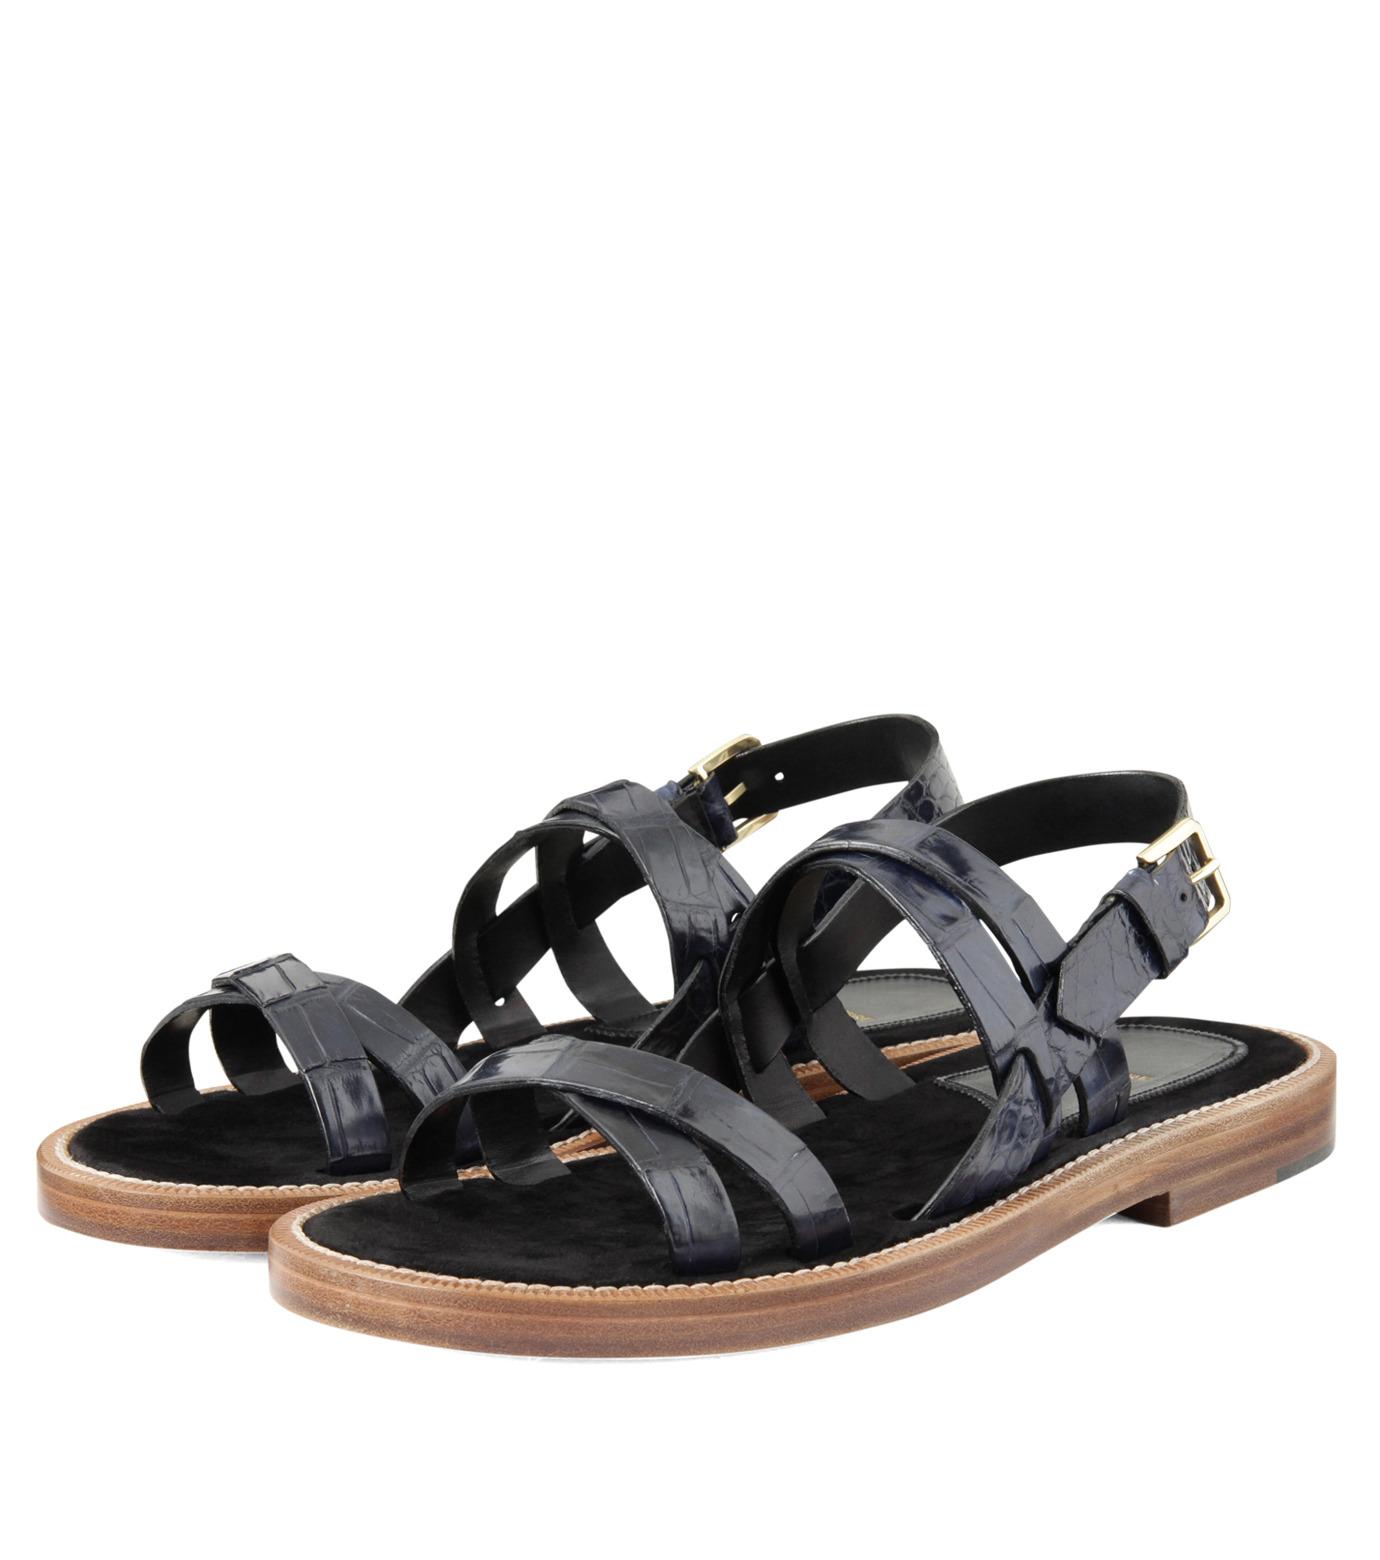 Max Verre(マックス ヴェッレ)のCross Strap Sandal-BLUE(シューズ/shoes)-MV918-POSITA-92 拡大詳細画像4